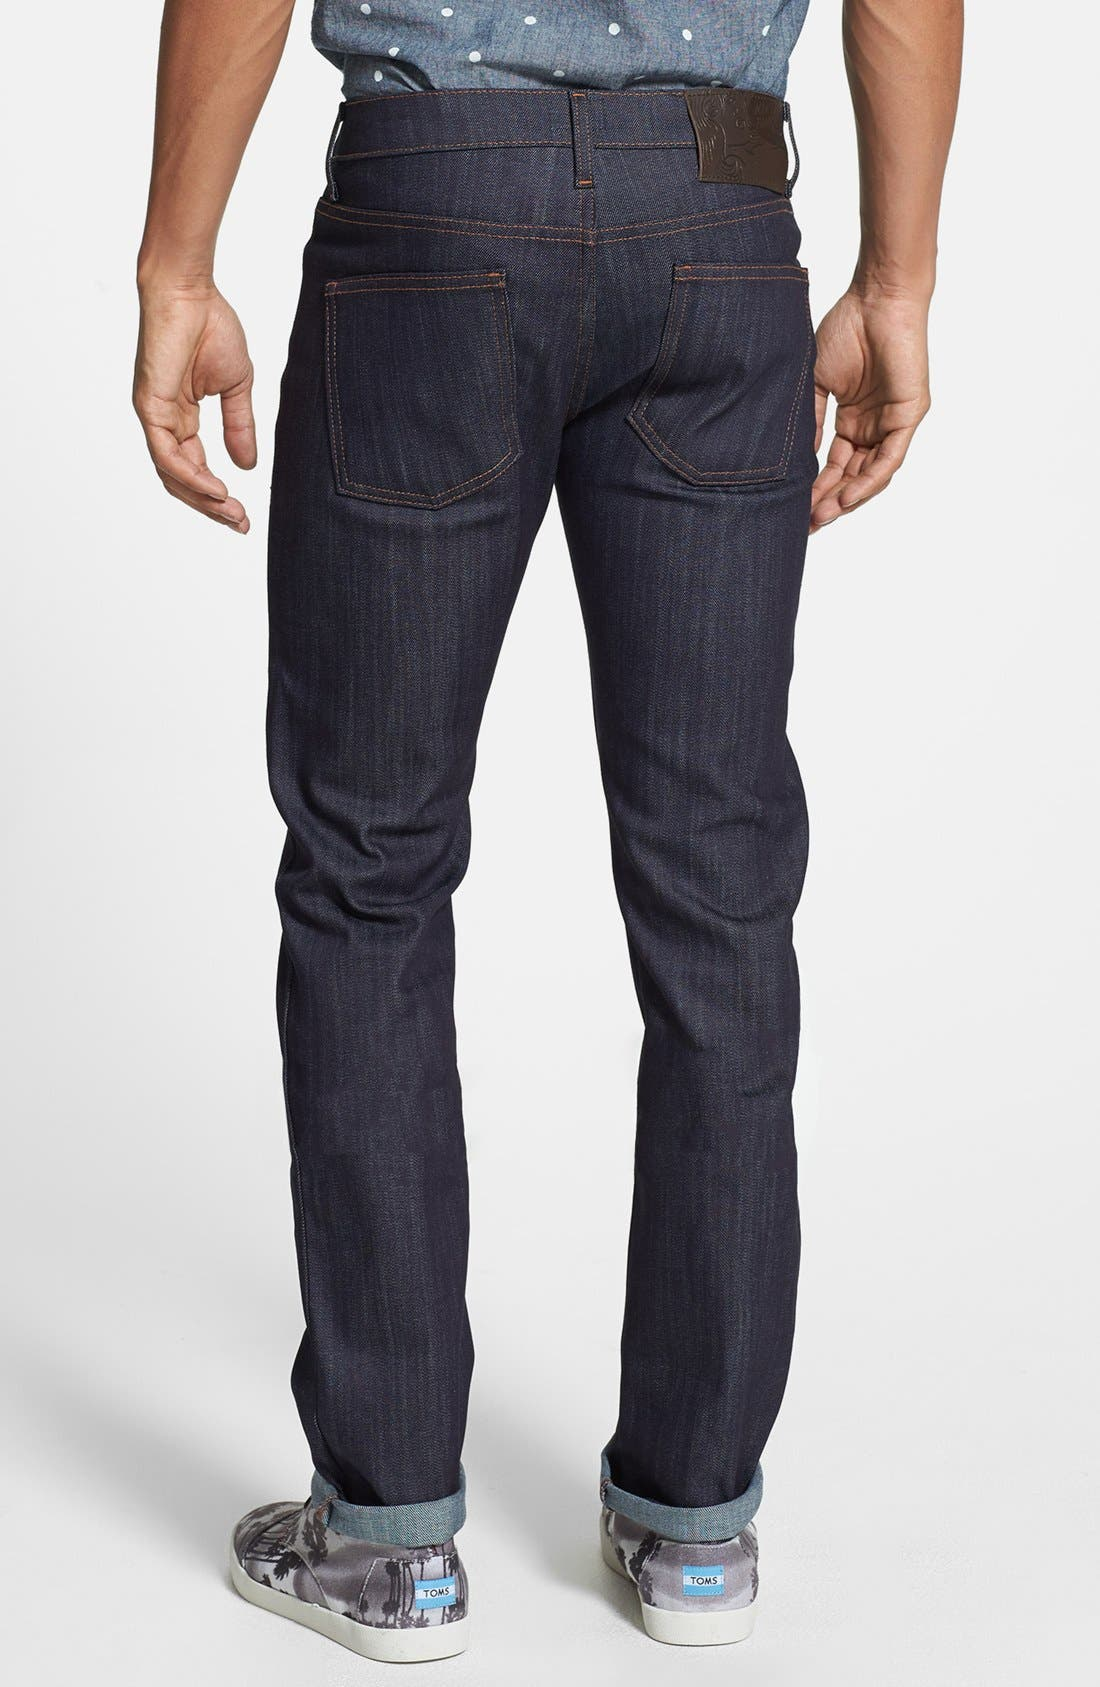 'Skinny Guy' Skinny Fit Jeans,                             Alternate thumbnail 4, color,                             401